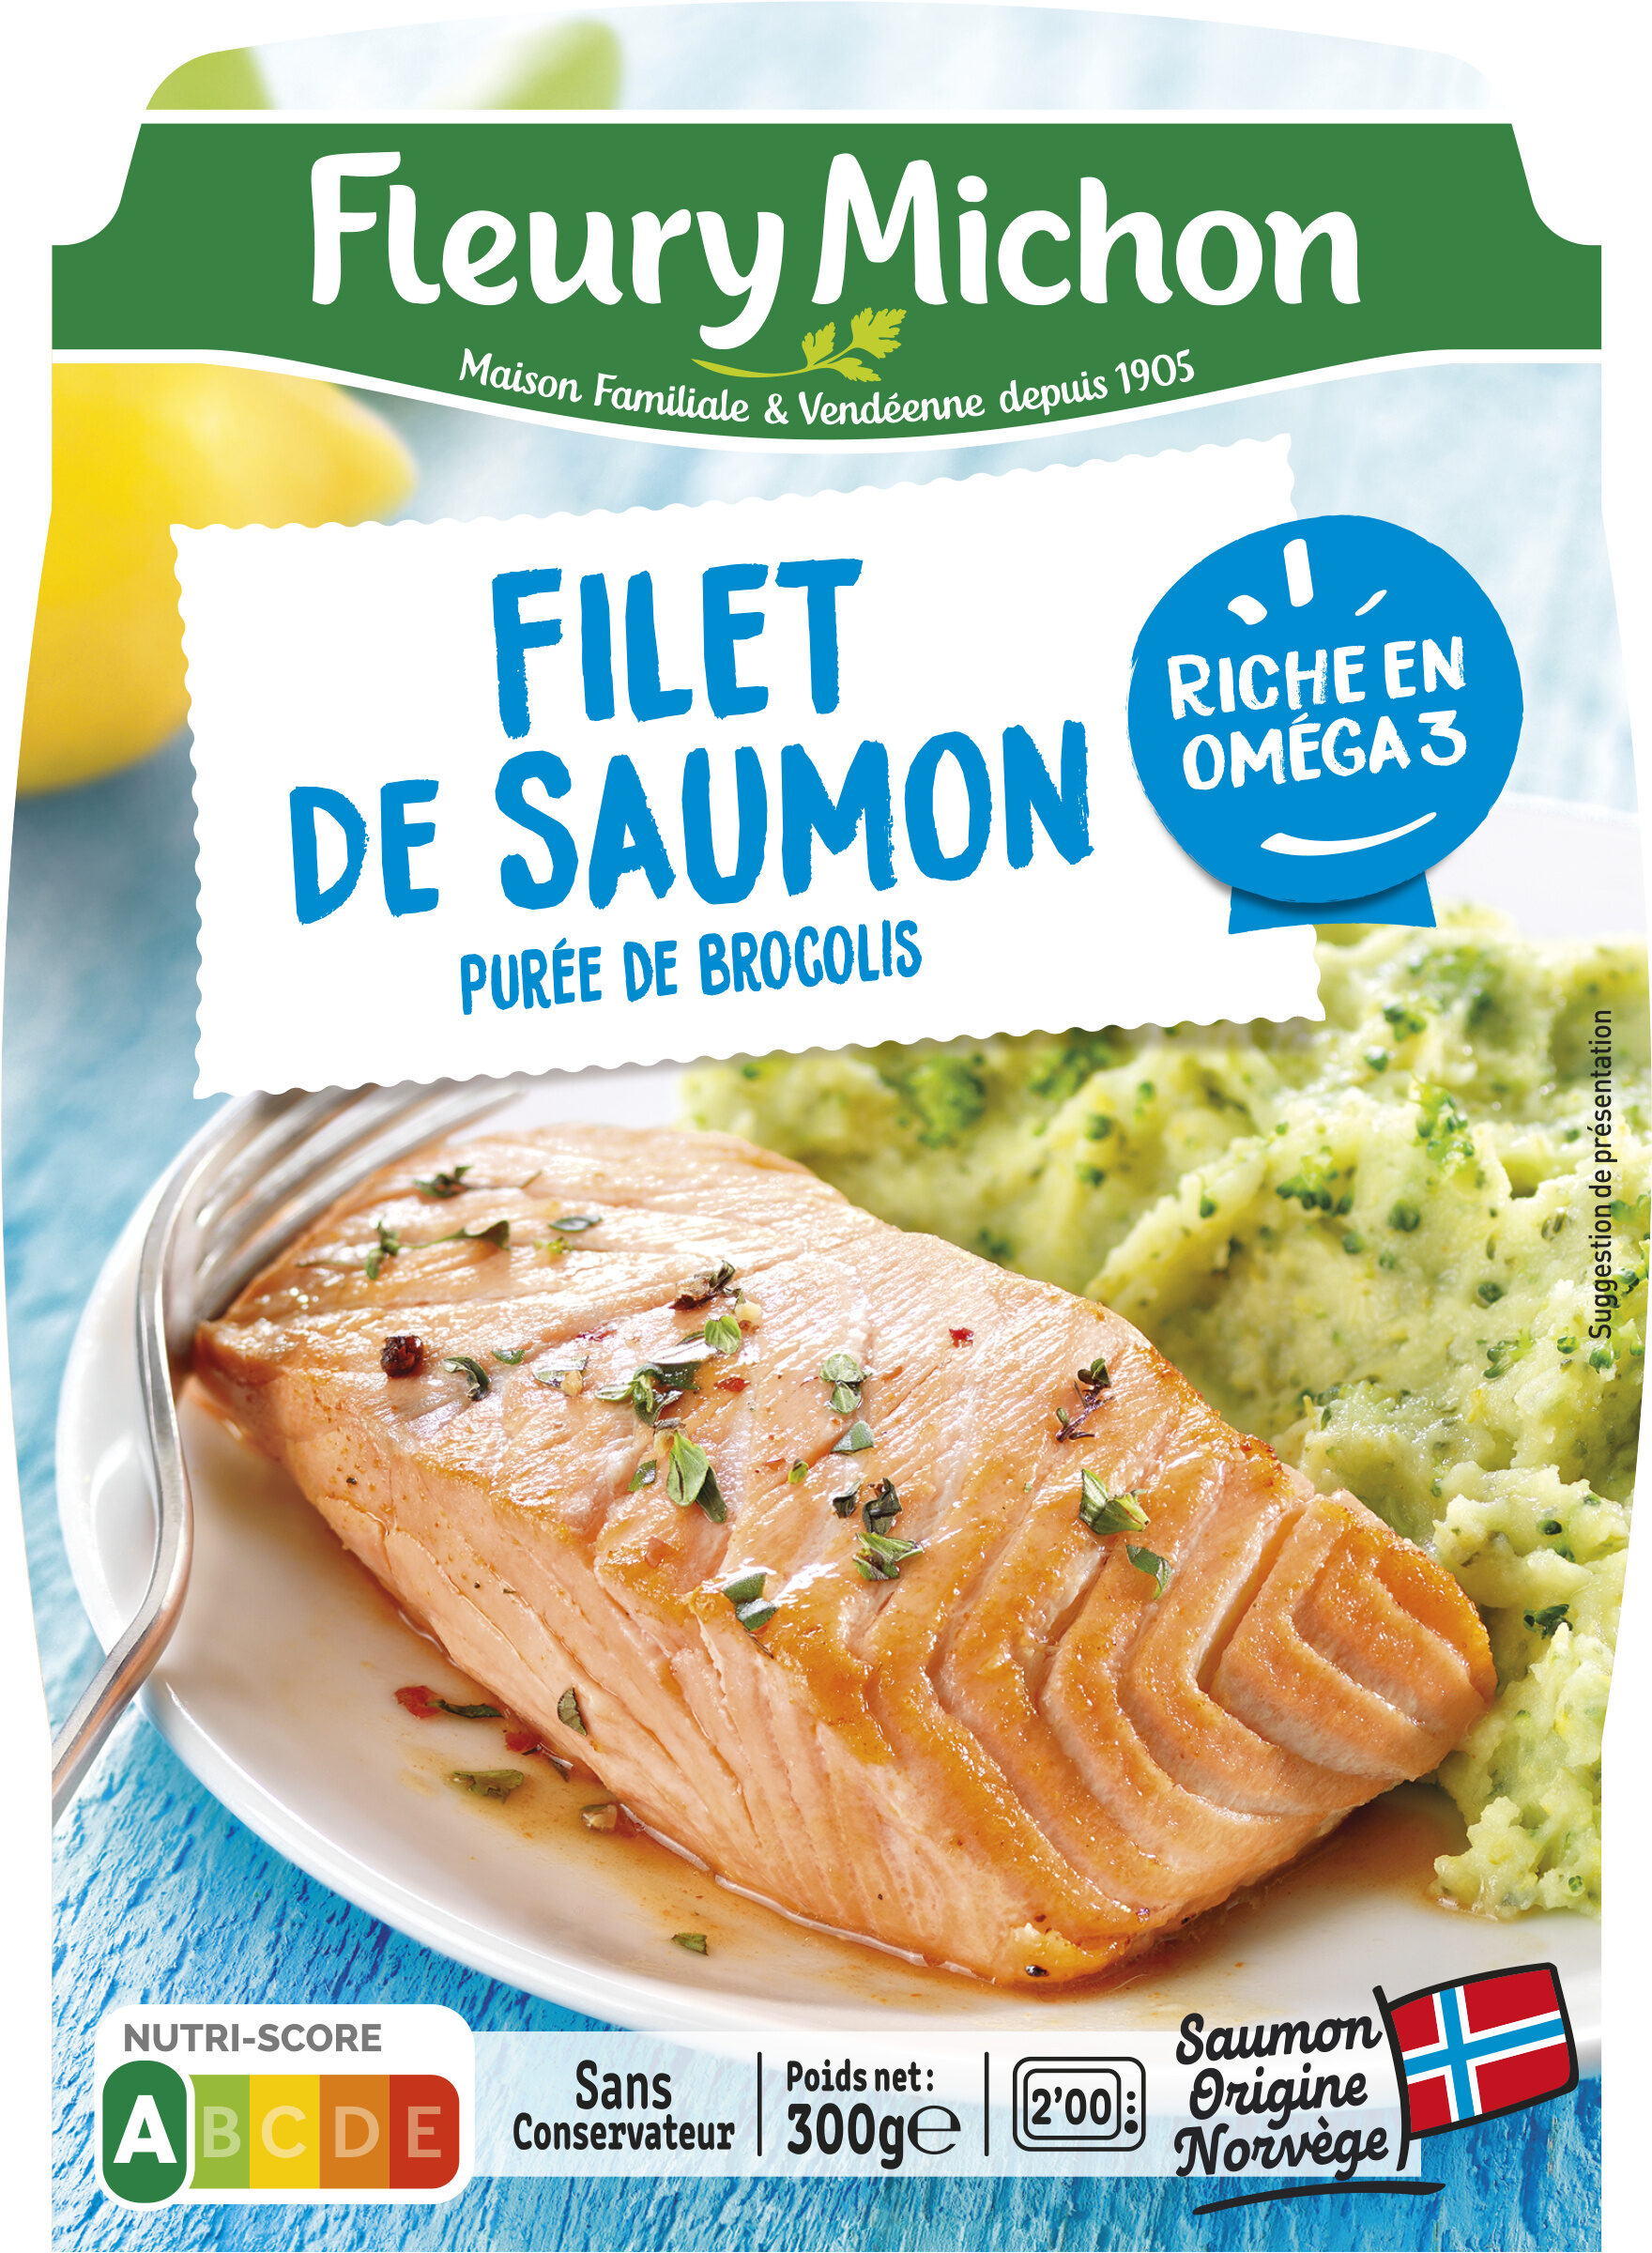 Filet de Saumon Purée de Brocolis - Prodotto - fr